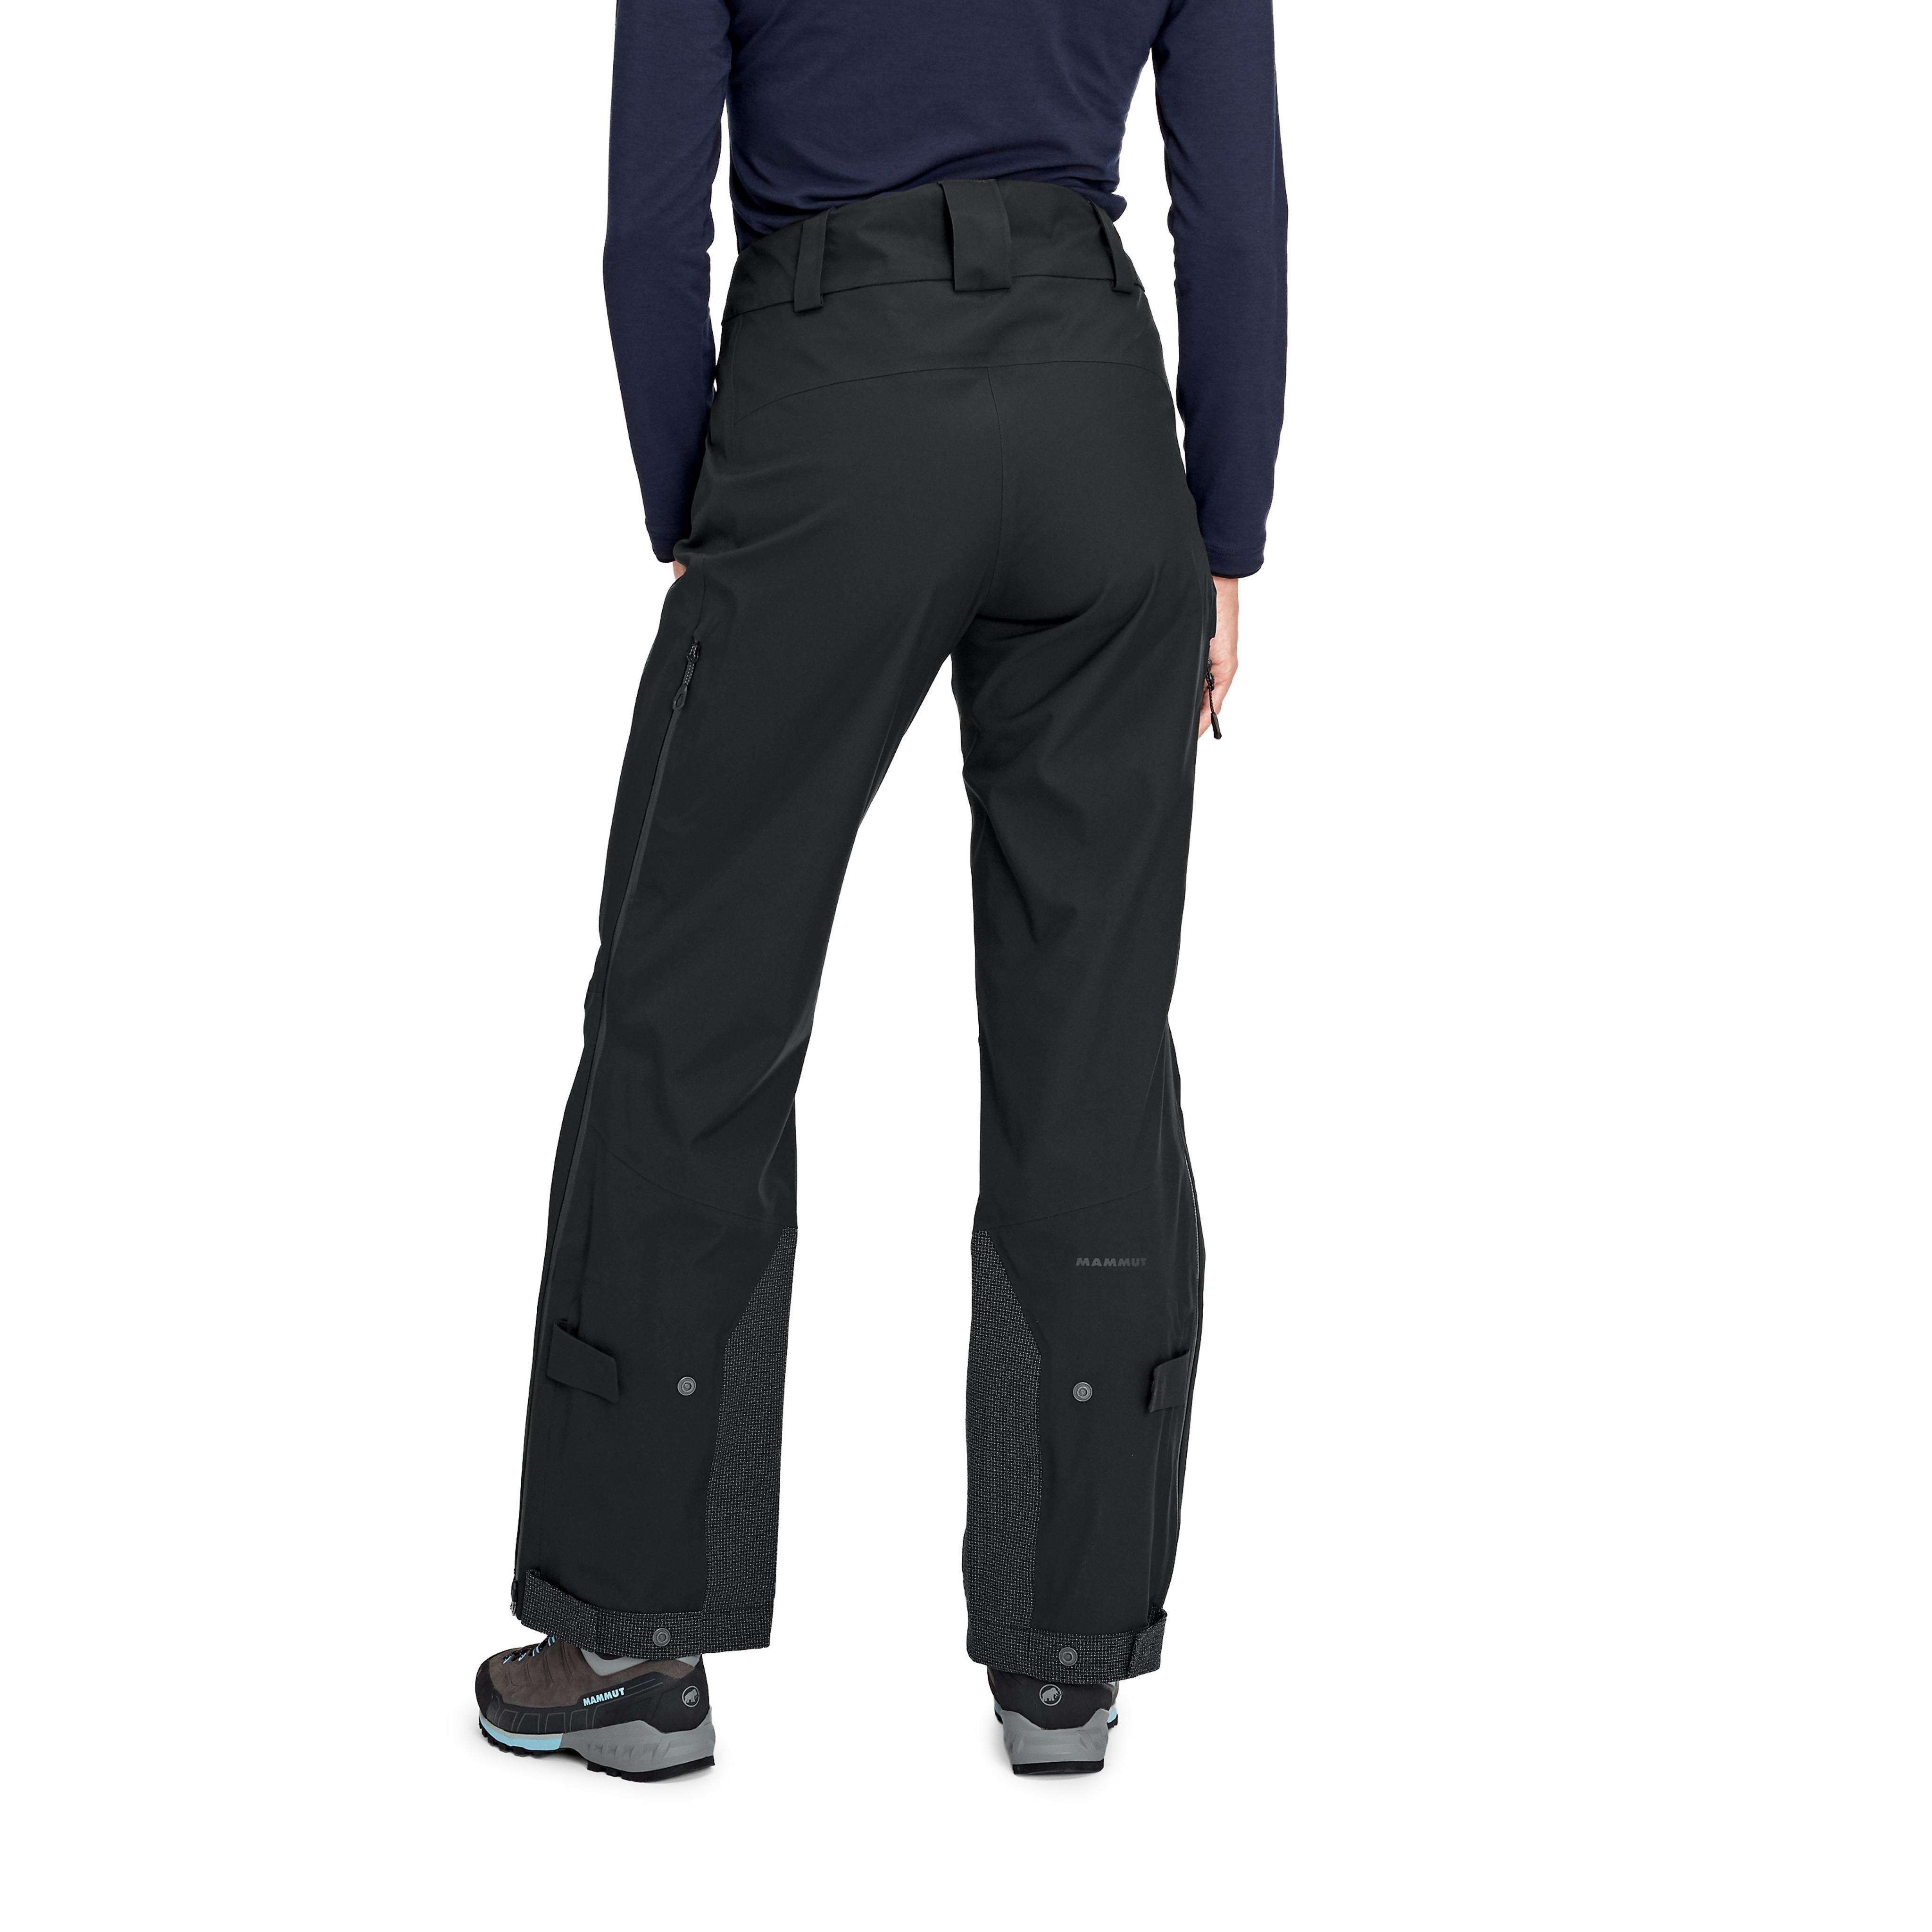 Masao HS Pants Women product image